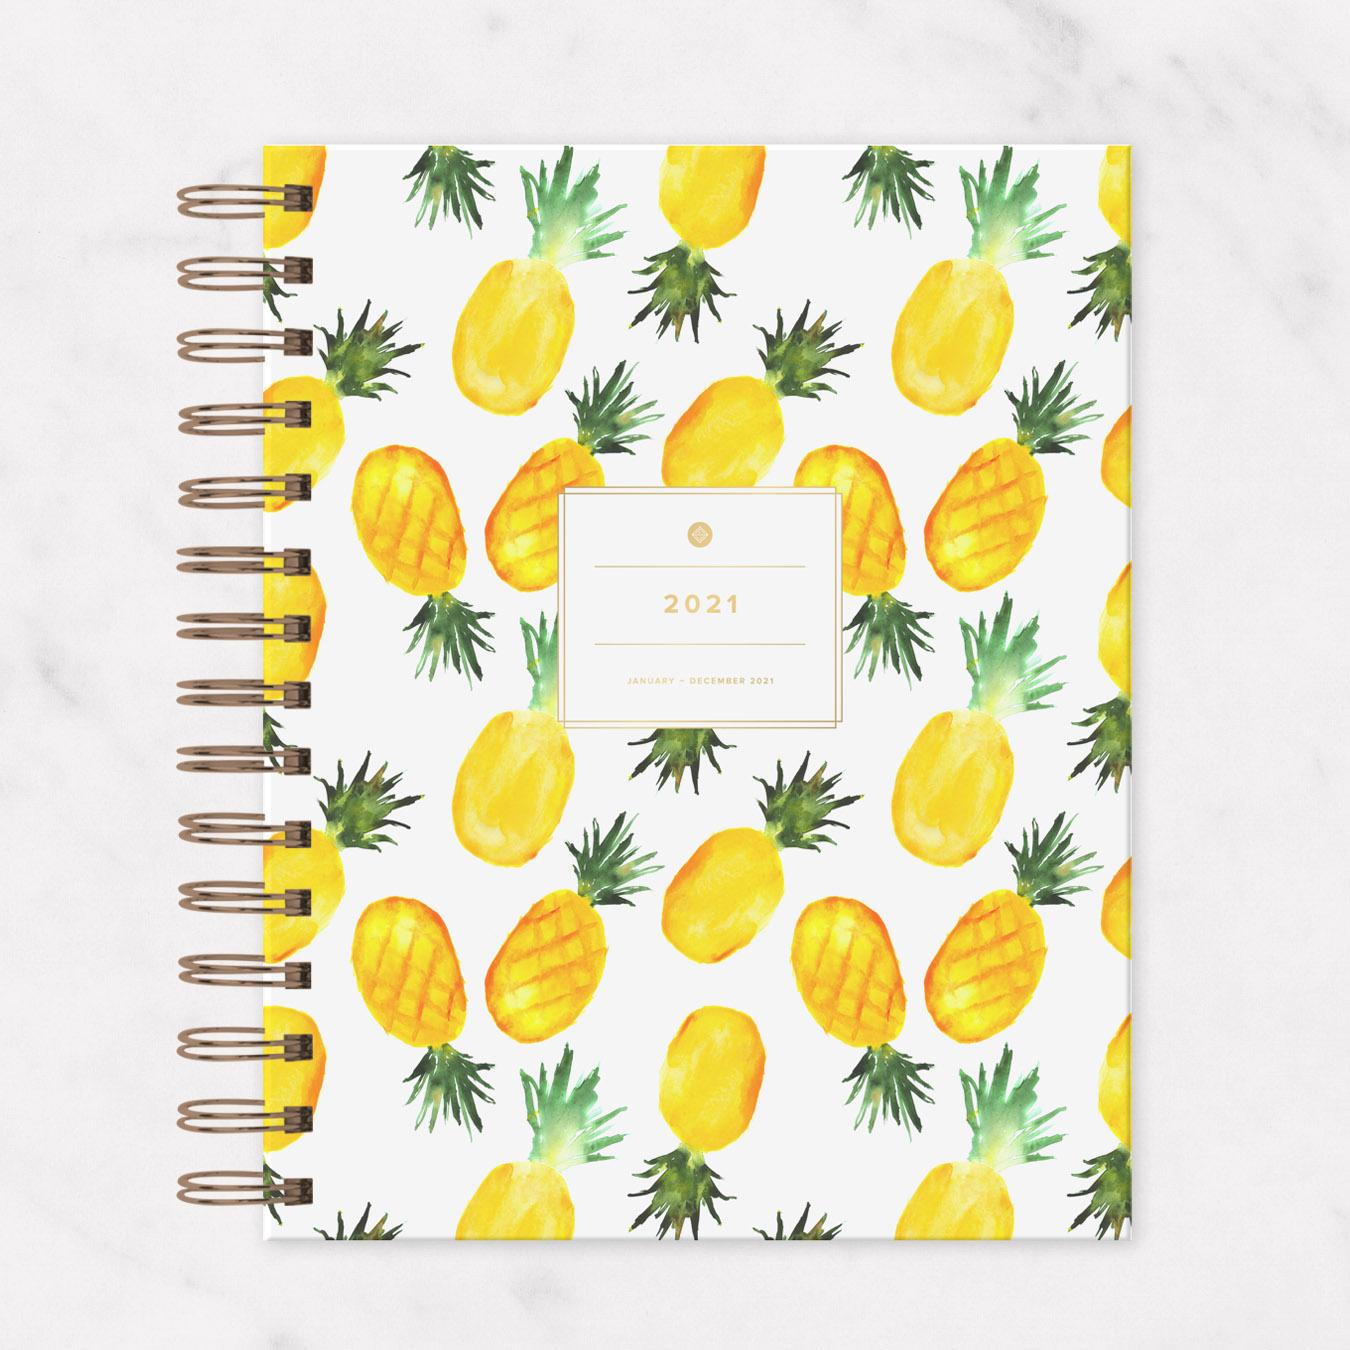 2021 IVF Planner Pineapple